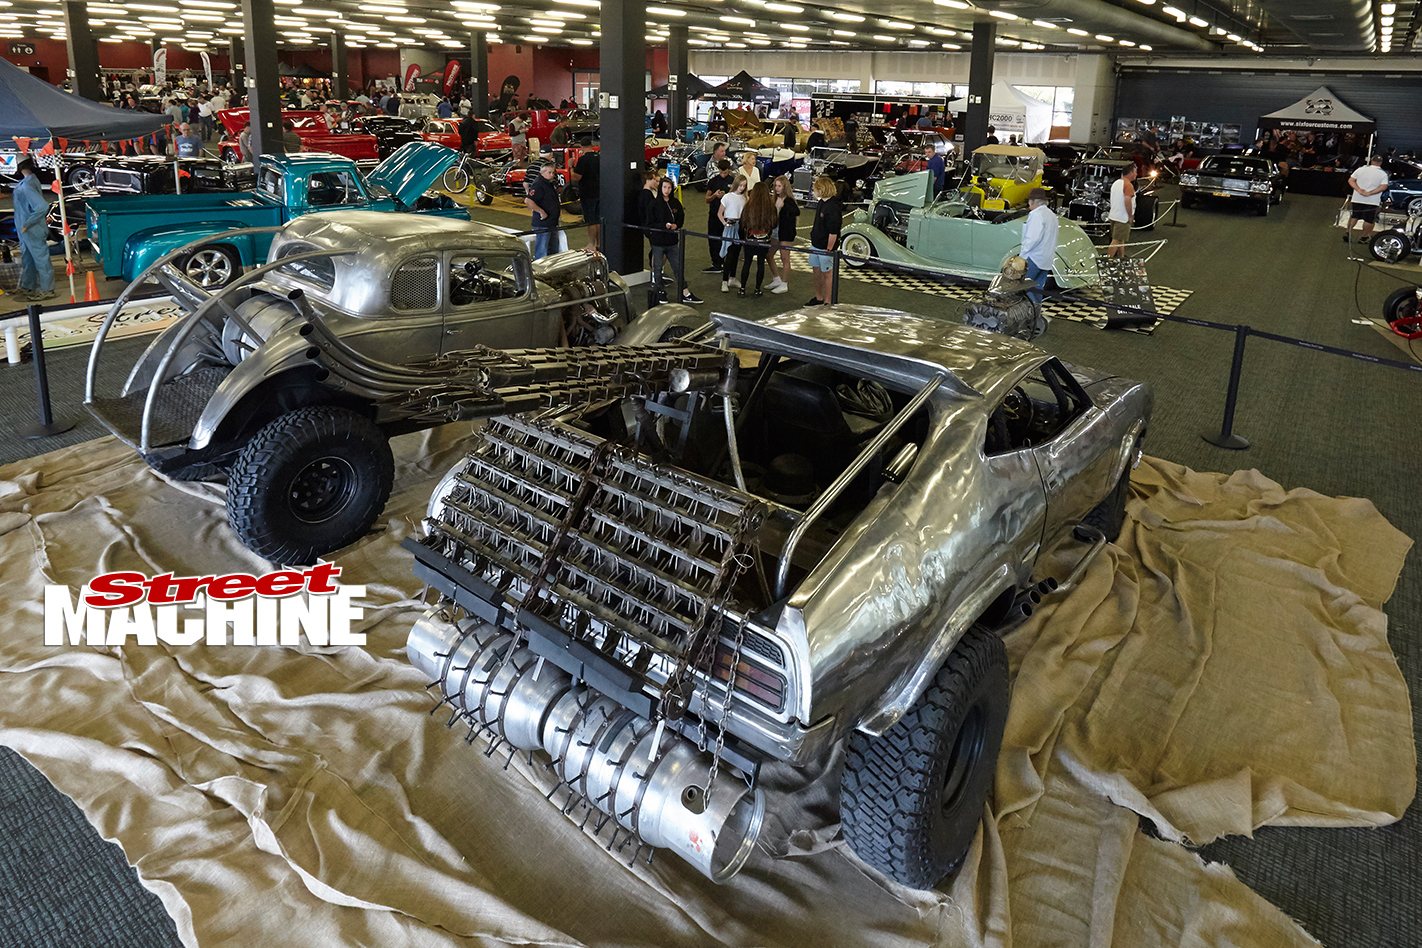 Mad -max -fury -road -cars -3